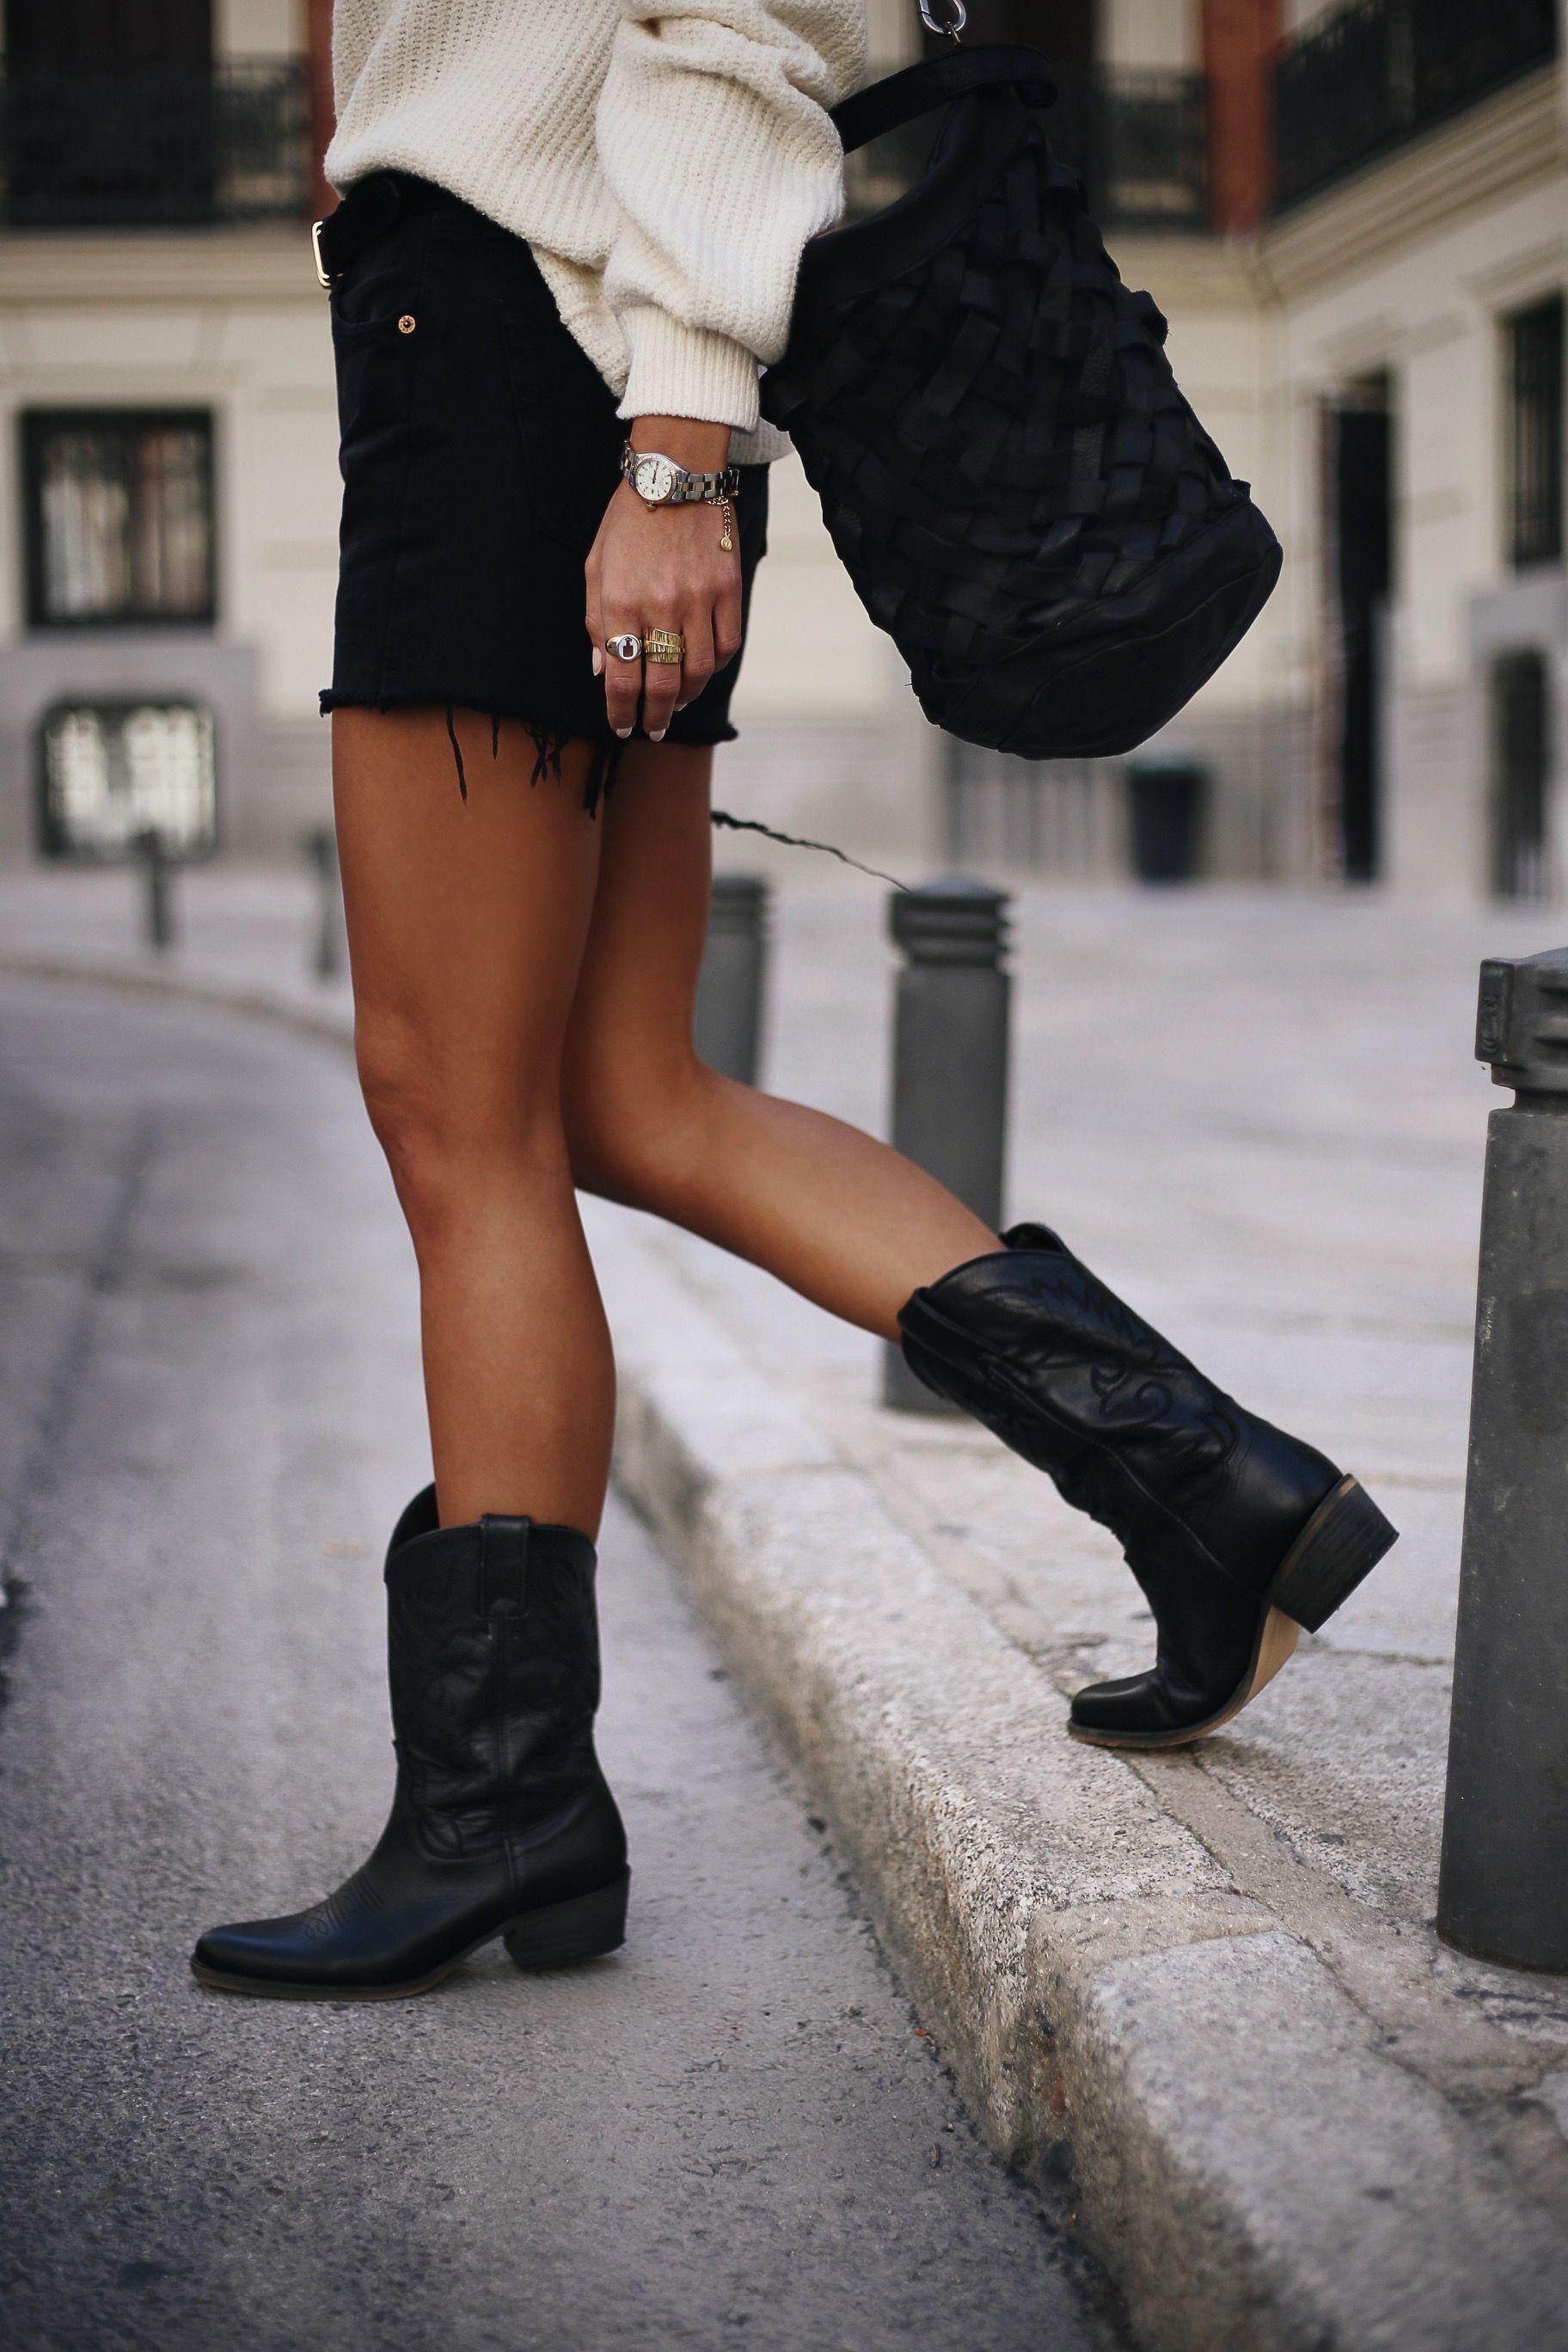 It Silvana Low Black Black Cowboy Boots Outfit Cowboy Boots Outfit Summer Black Cowgirl Boots Outfit [ 2736 x 1824 Pixel ]